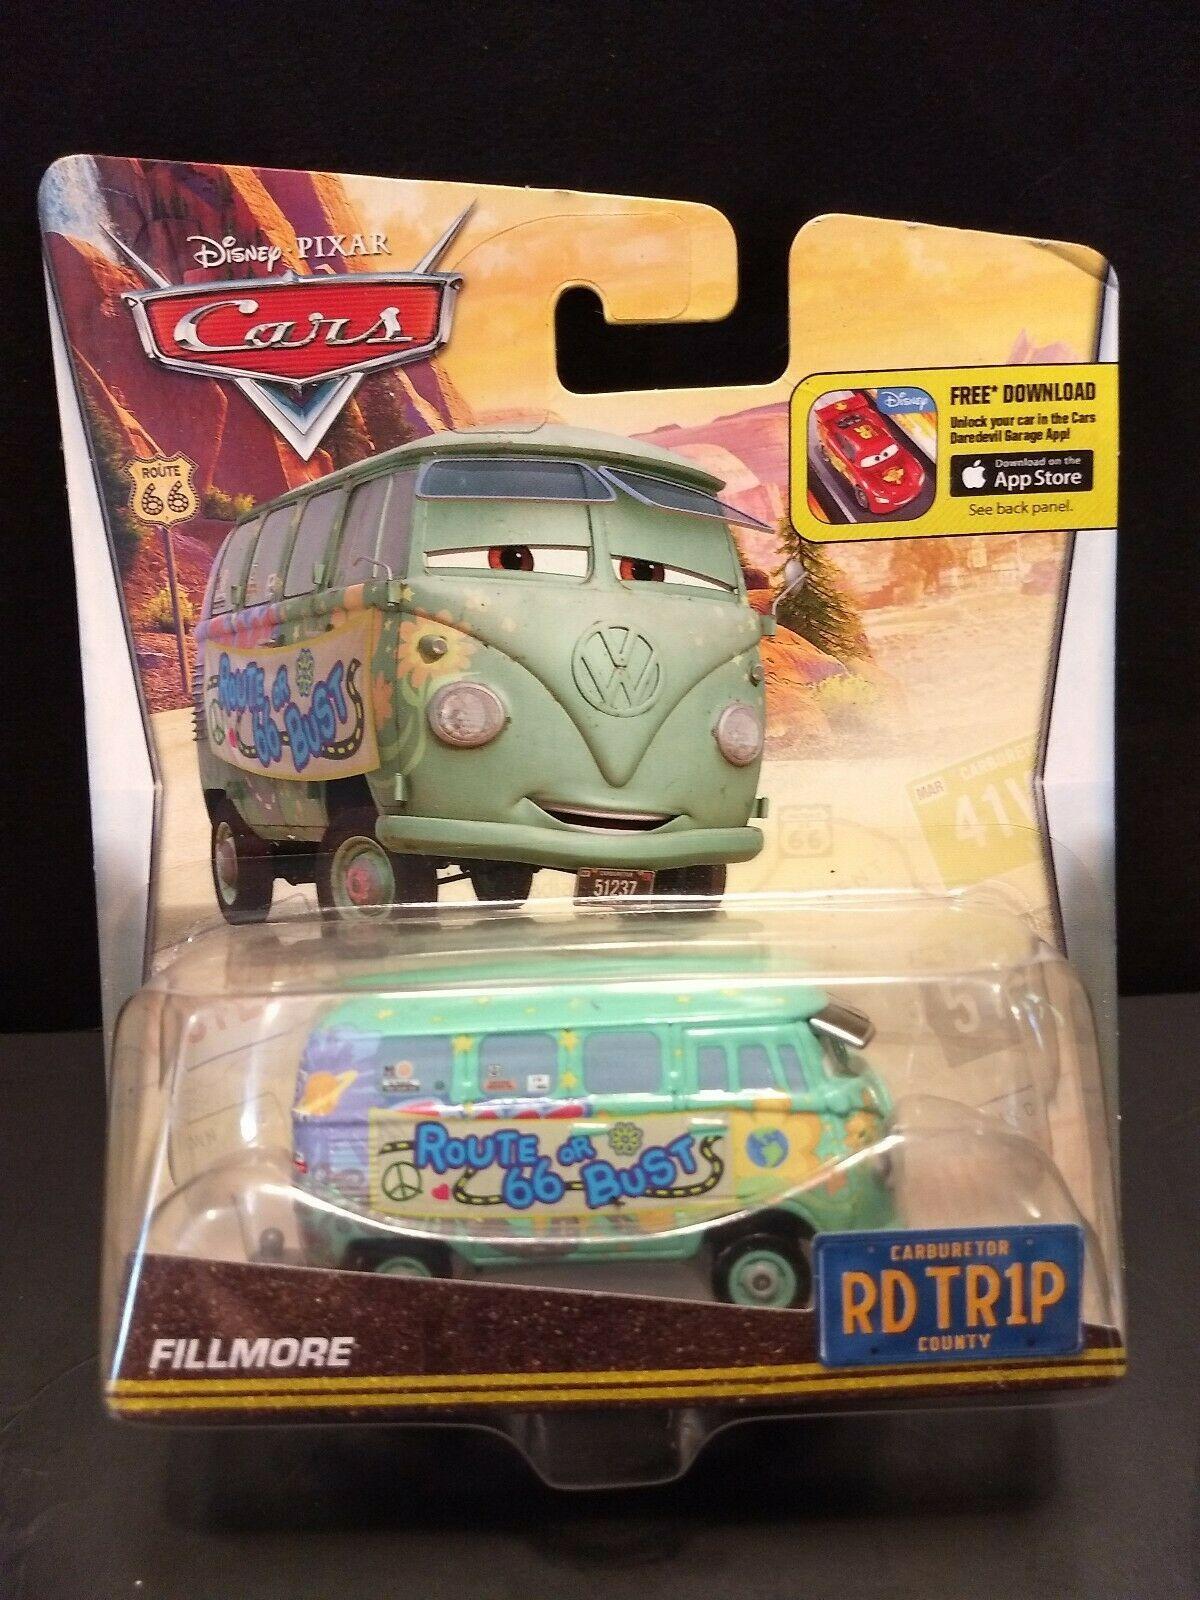 Sealed 2015 Mattel Pixar Disney Cars Fillmore Road Trip toy van Route 66 or Bust image 8